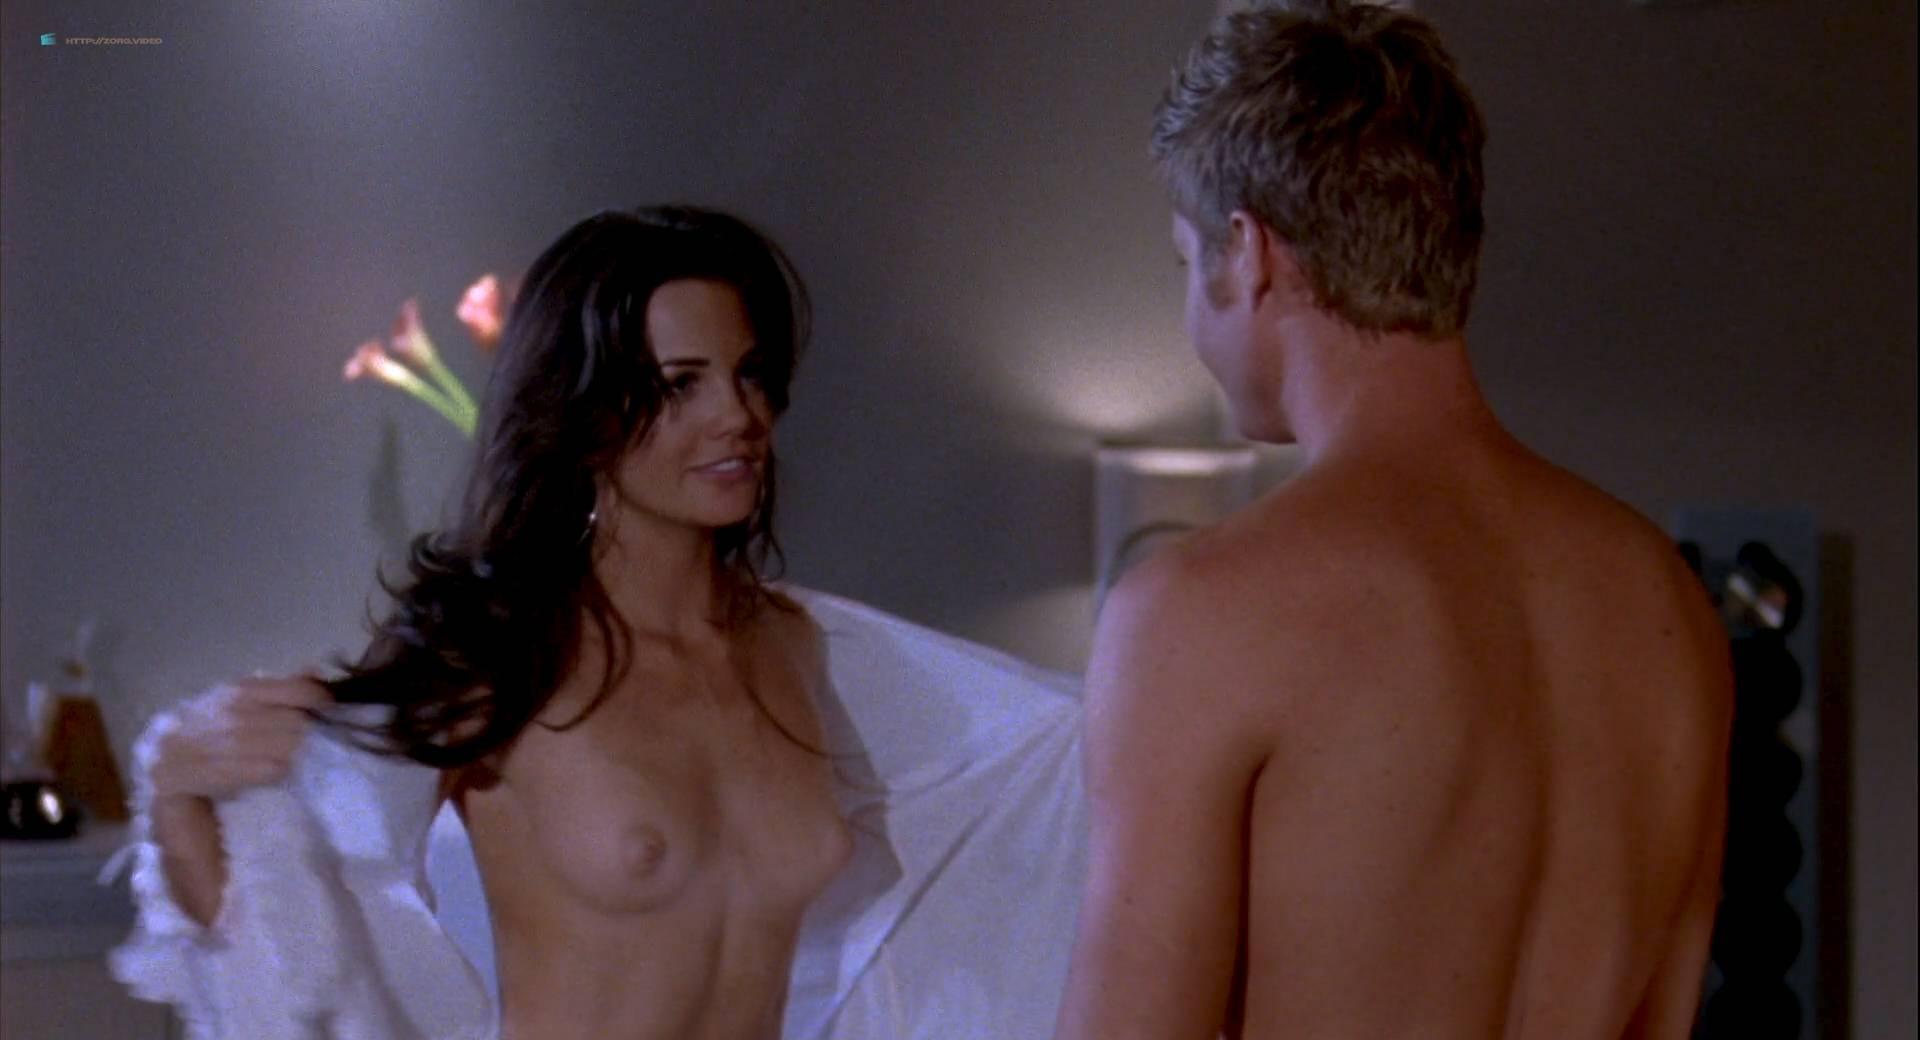 marnette patterson nude pics